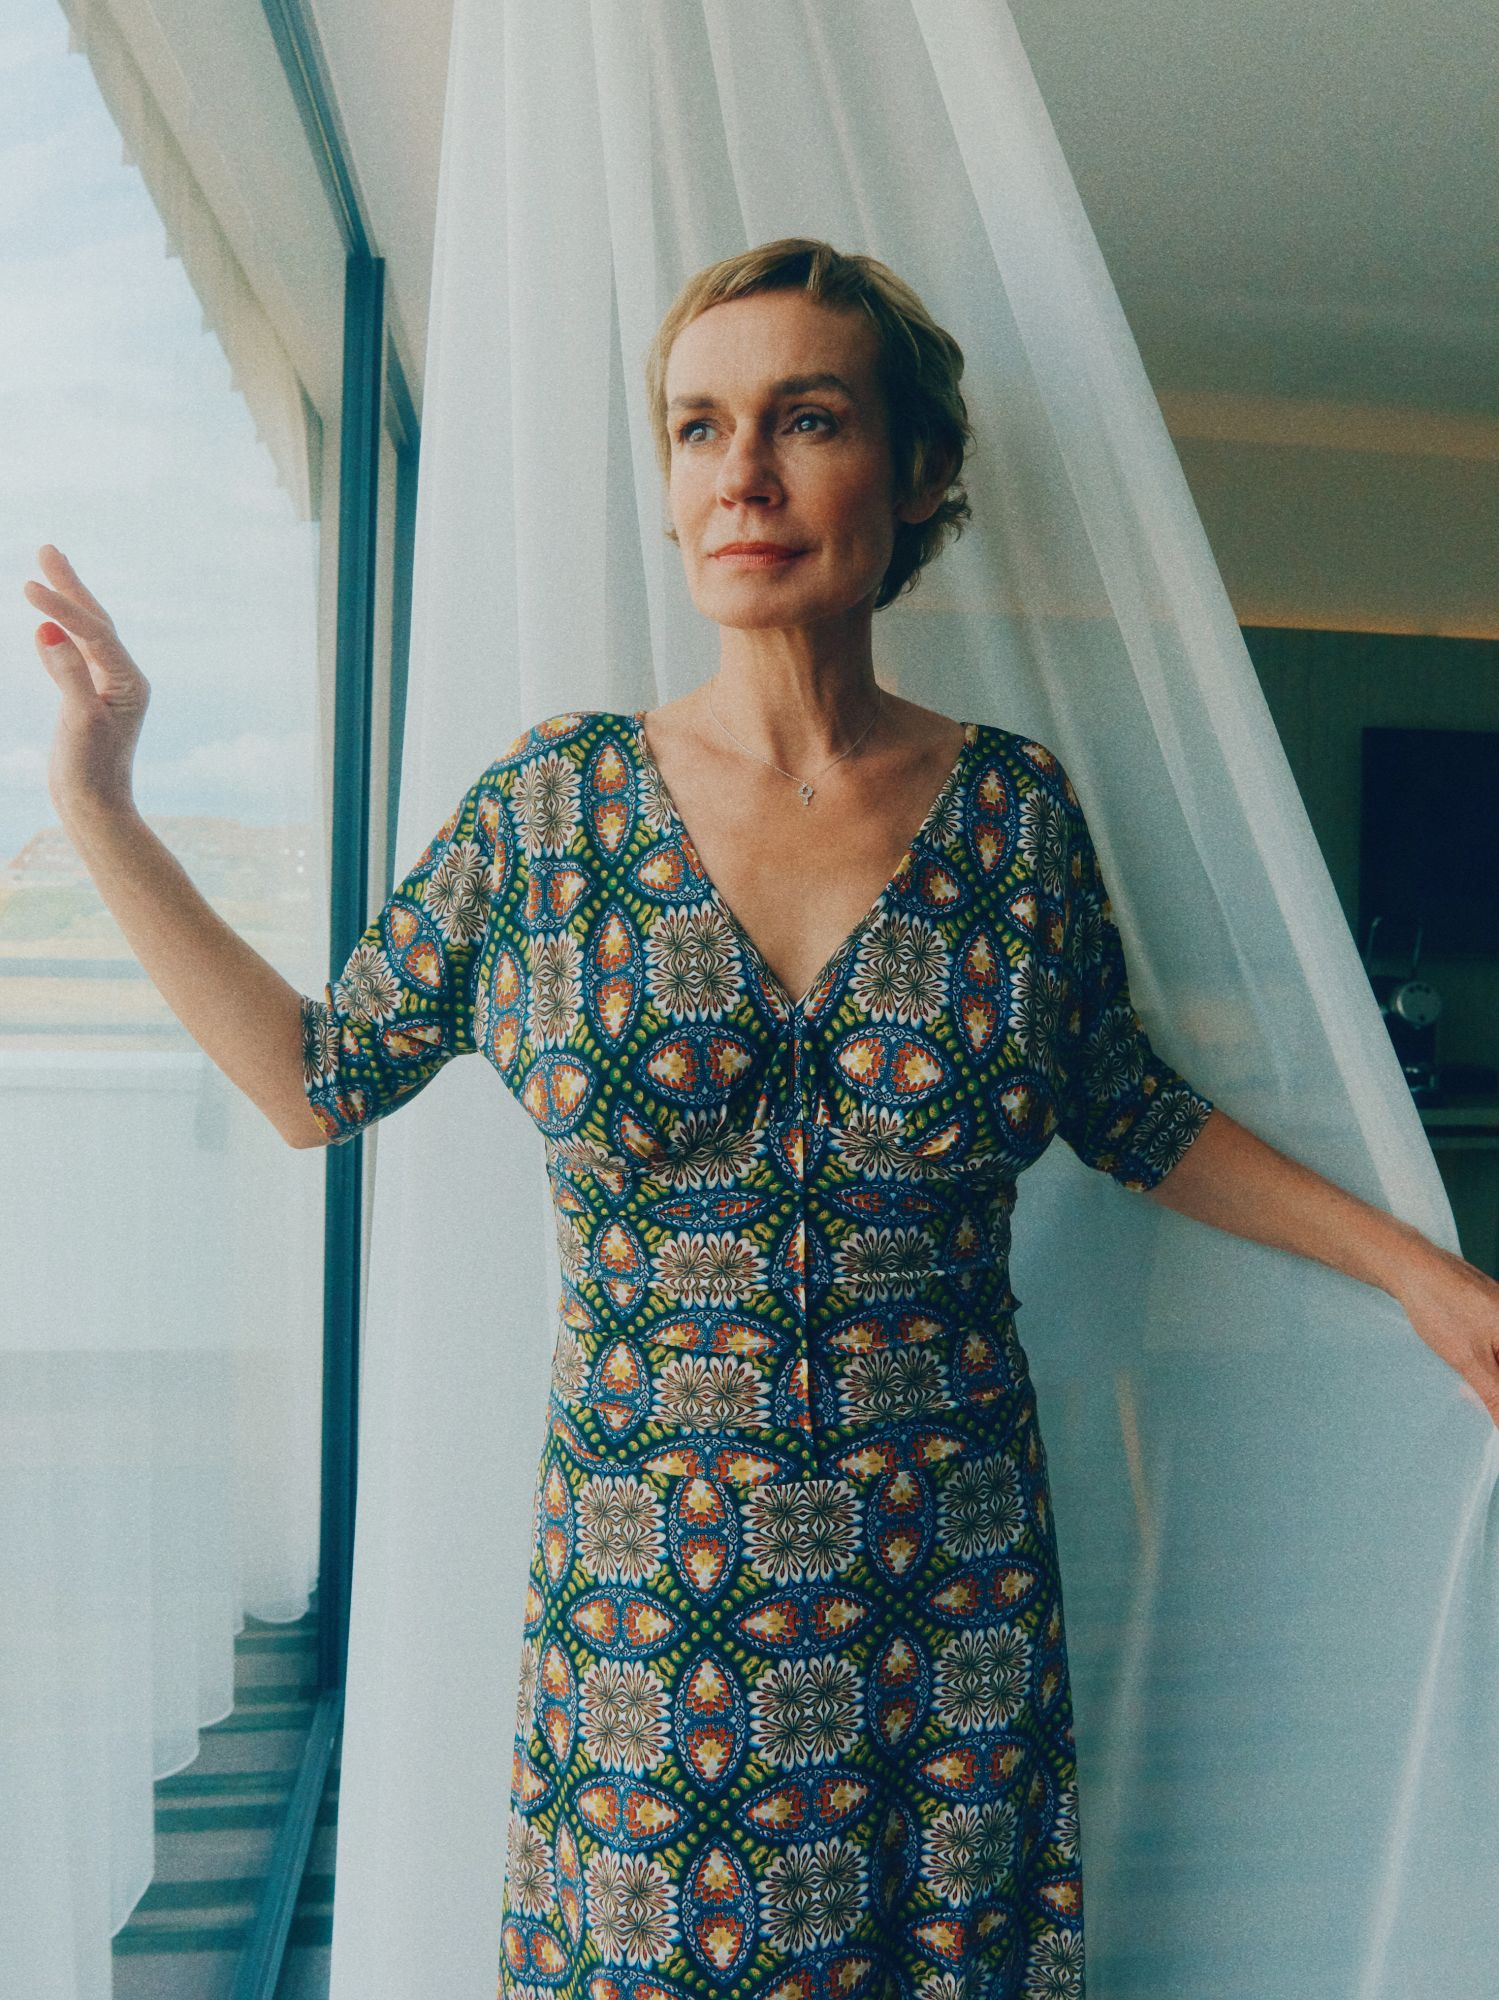 Sandrine Bonnaire, Présidente du Grand Jury Maquillage : Dr. Hauschka Coiffure : Franck Provost